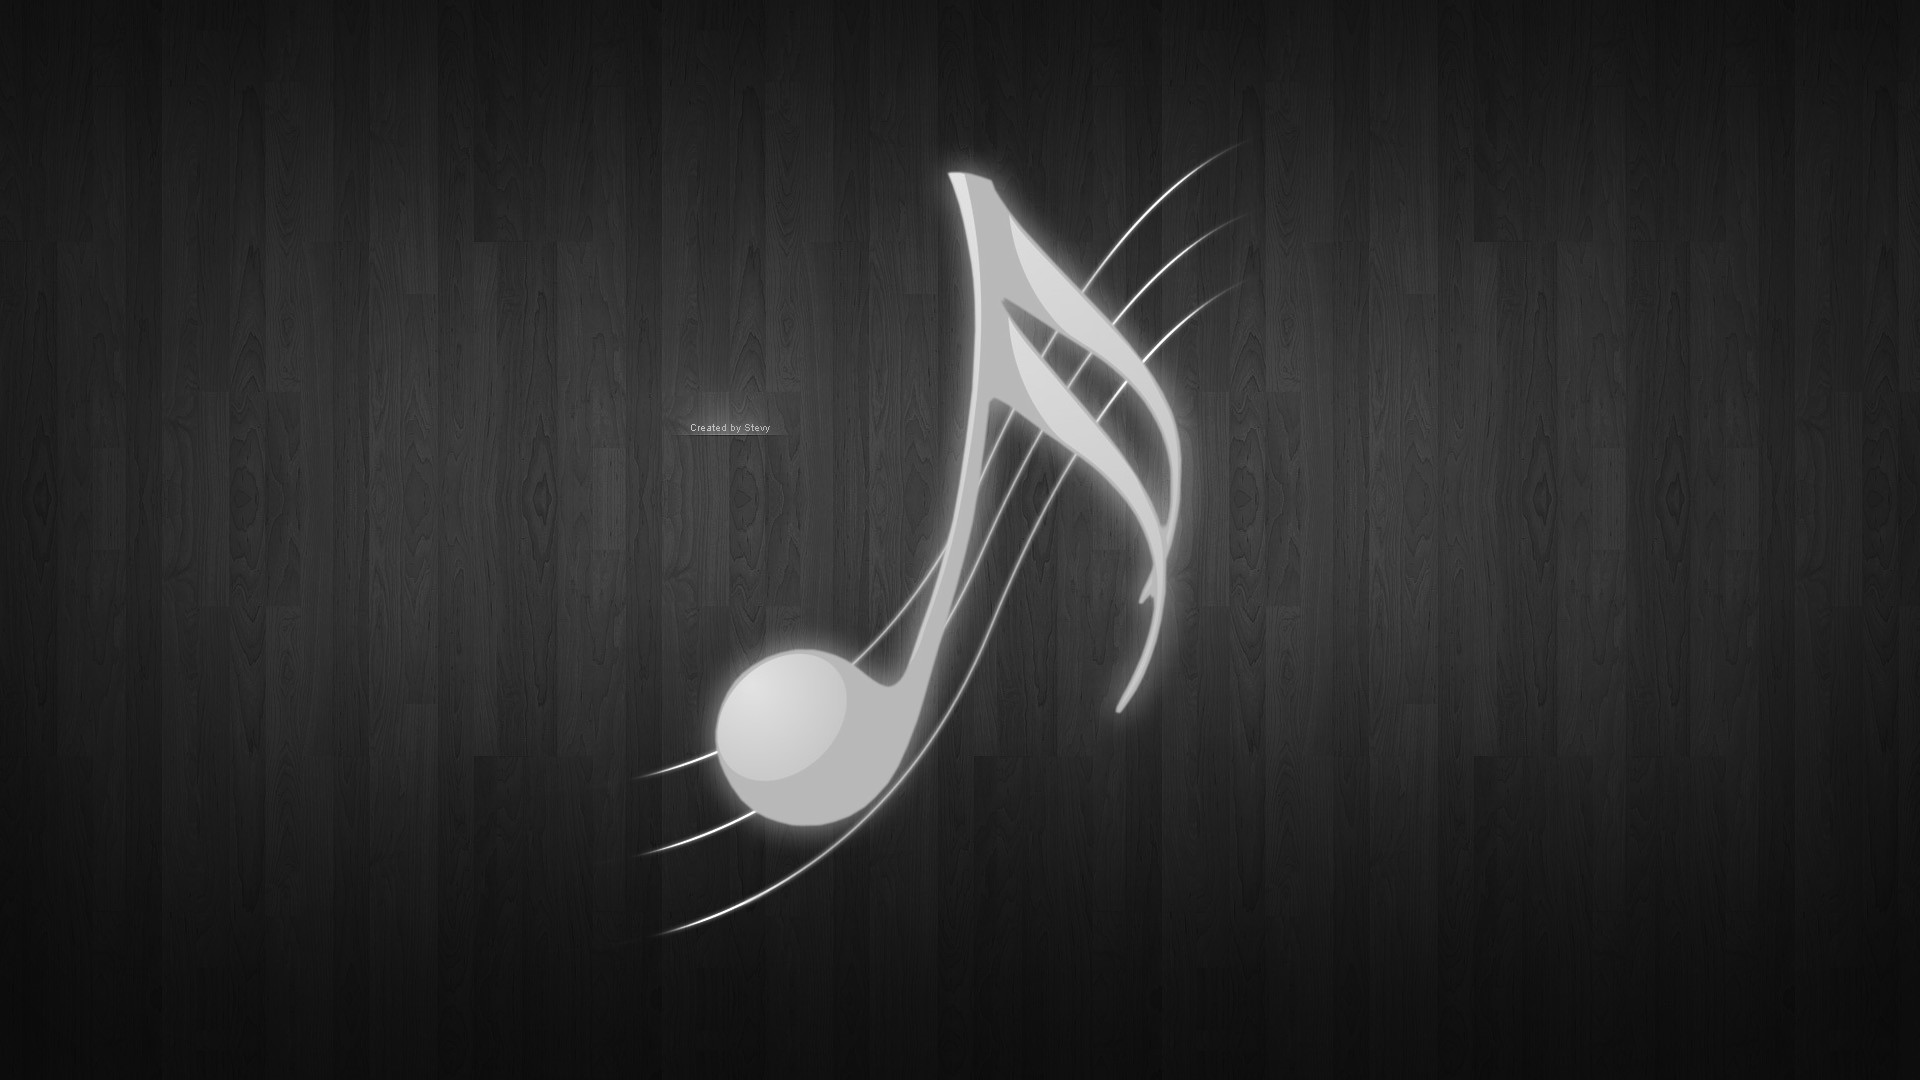 Music Wallpaper Download #3830 Wallpaper | Cool Walldiskpaper.com